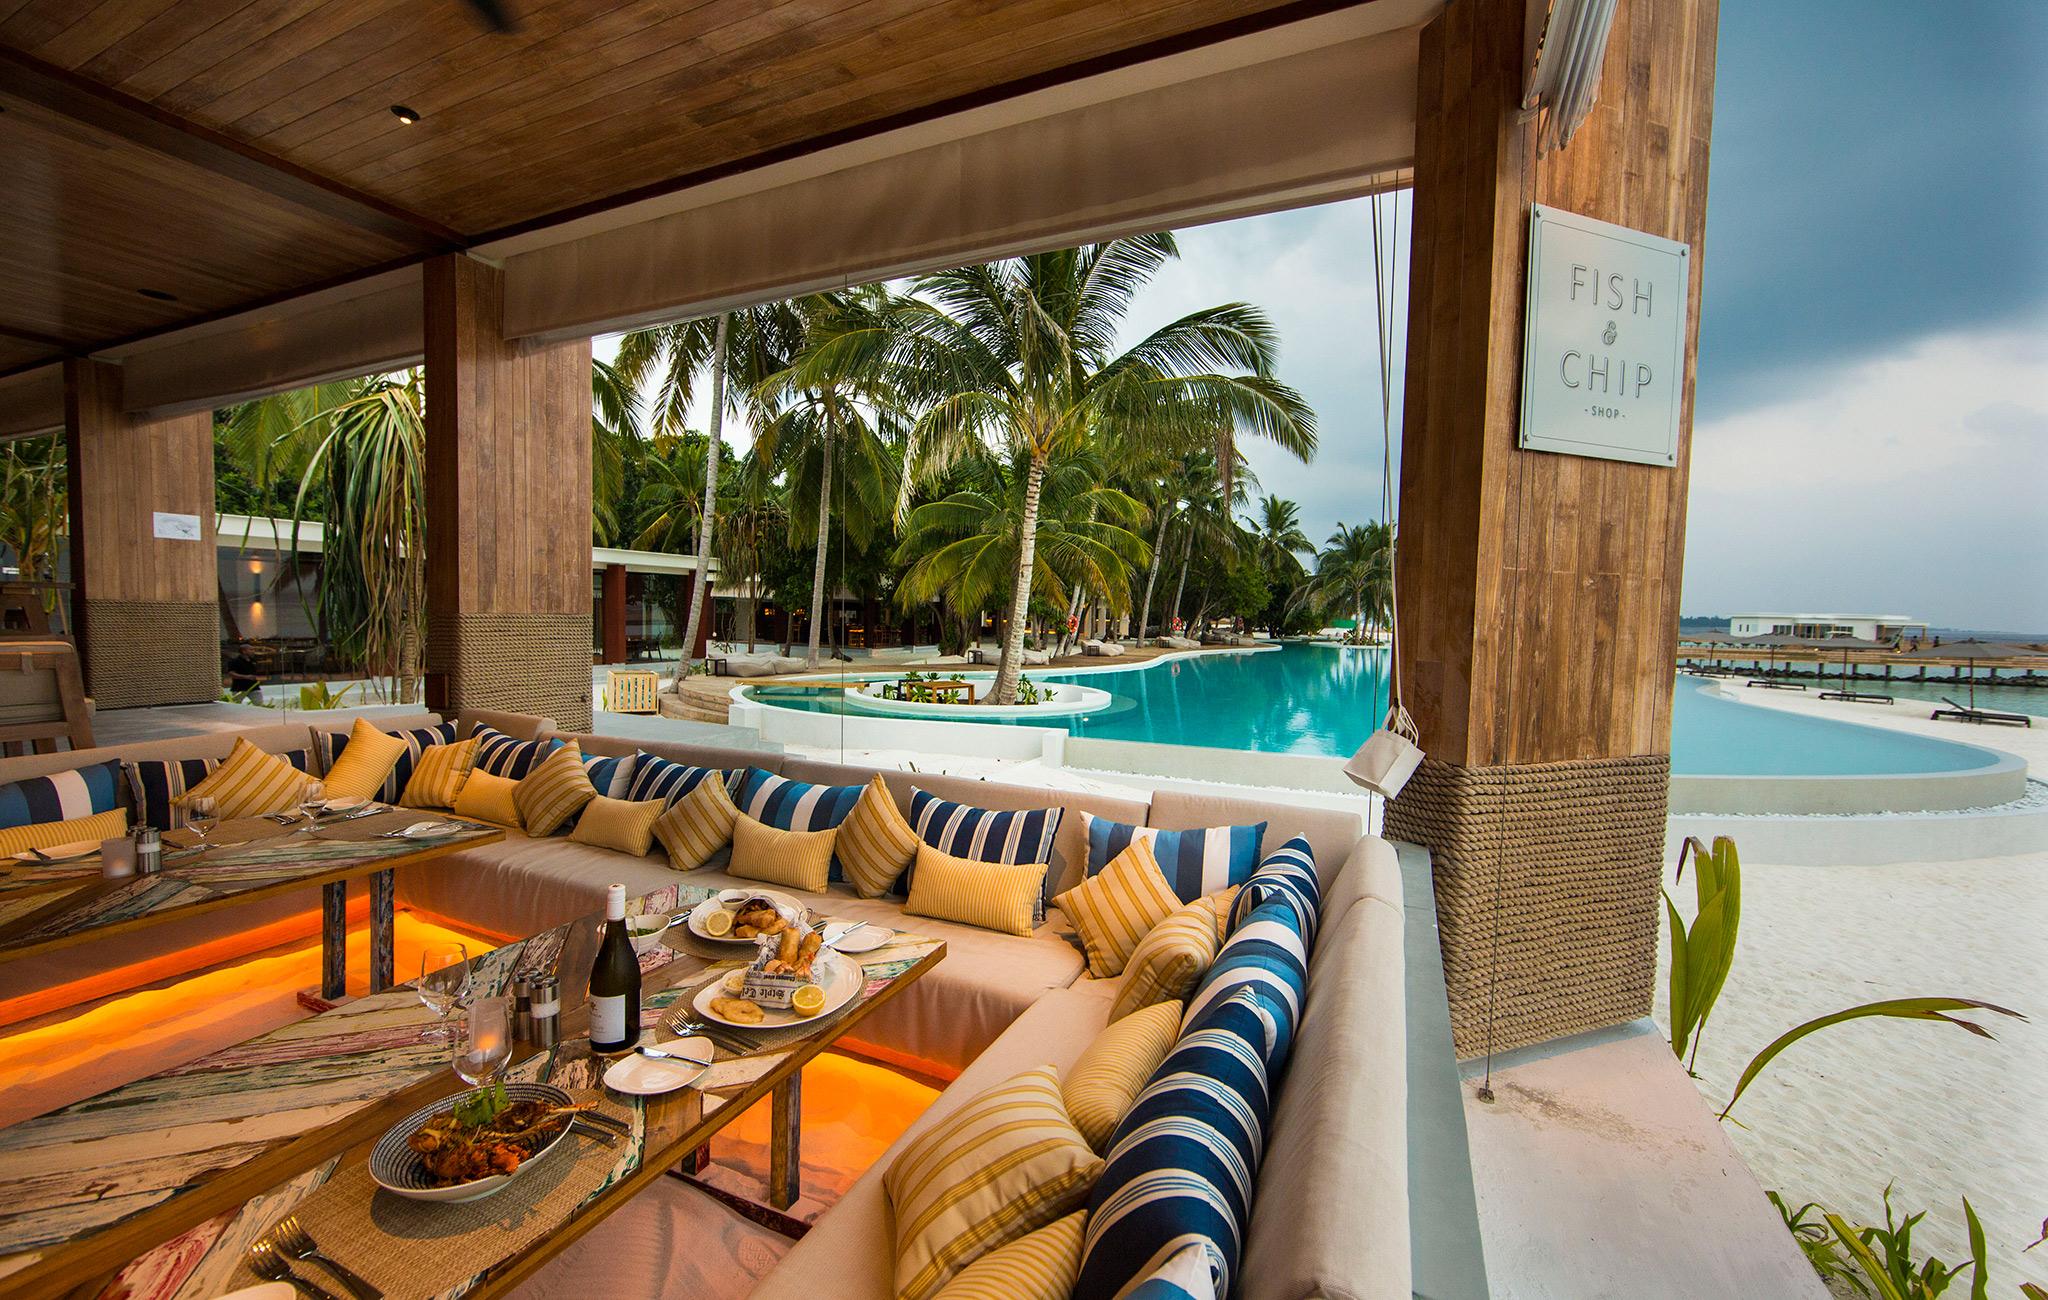 Fish & Chips Restaurant, Amilla Fushi, Baa Atoll, Malediven